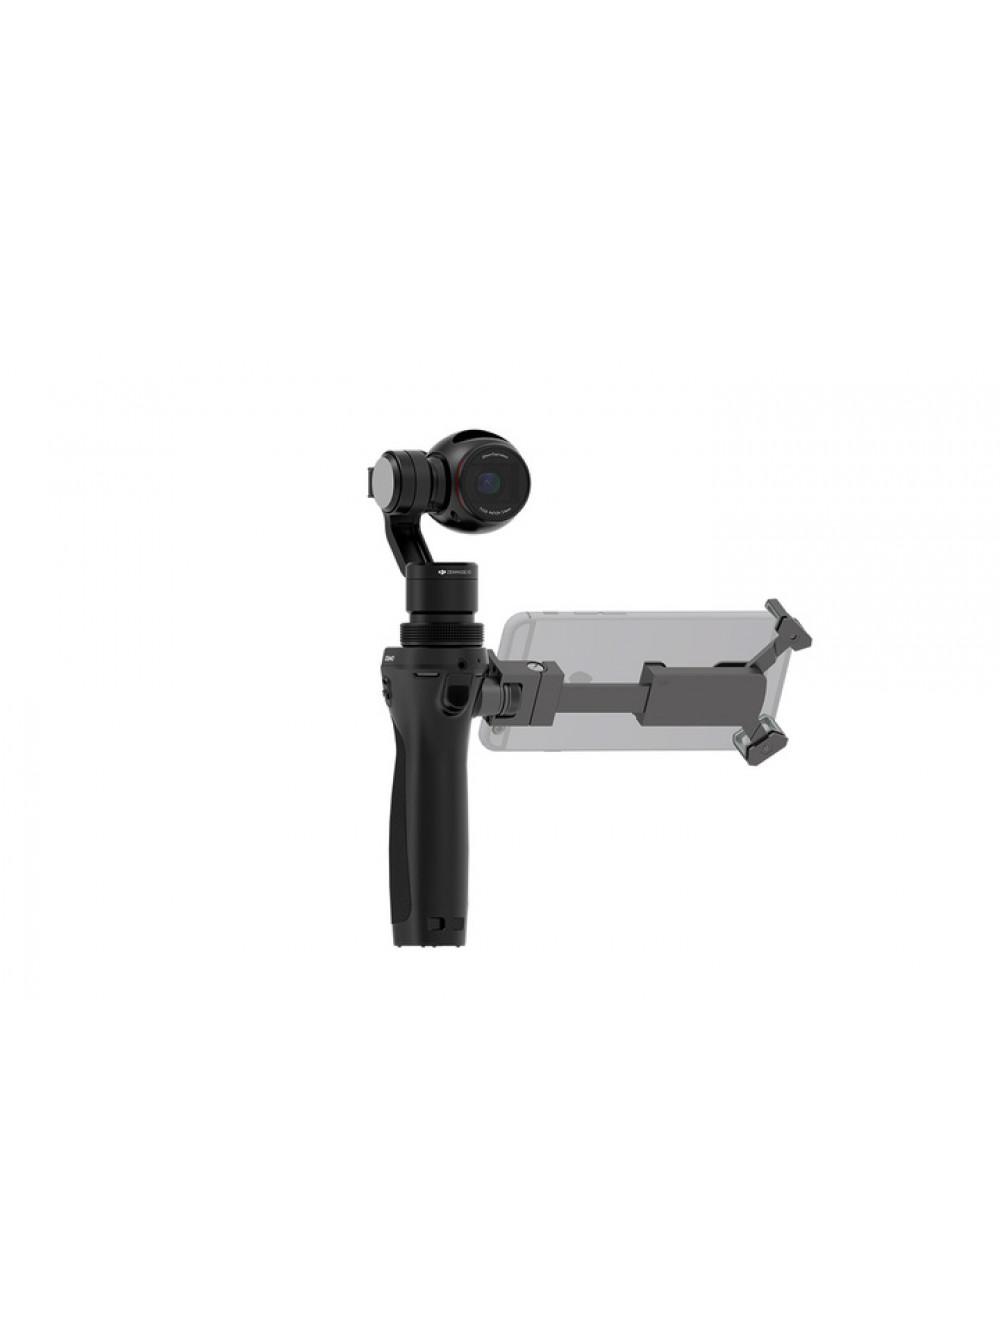 DJI Osmo ручная видеокамера (4K видео)